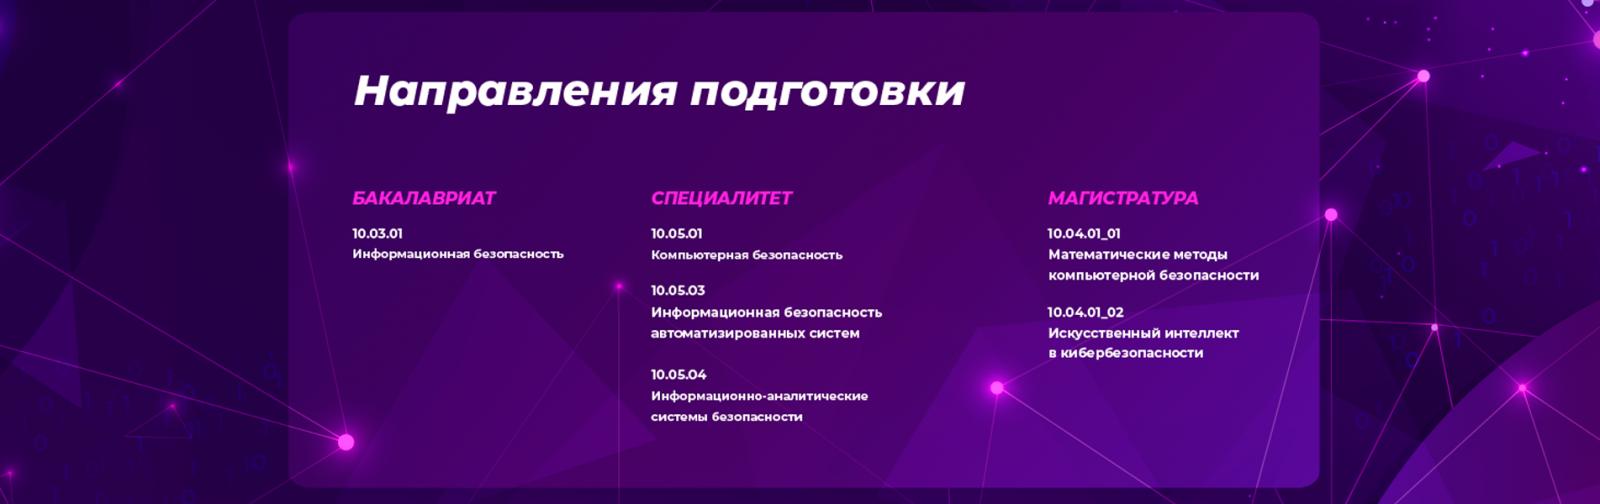 main_info